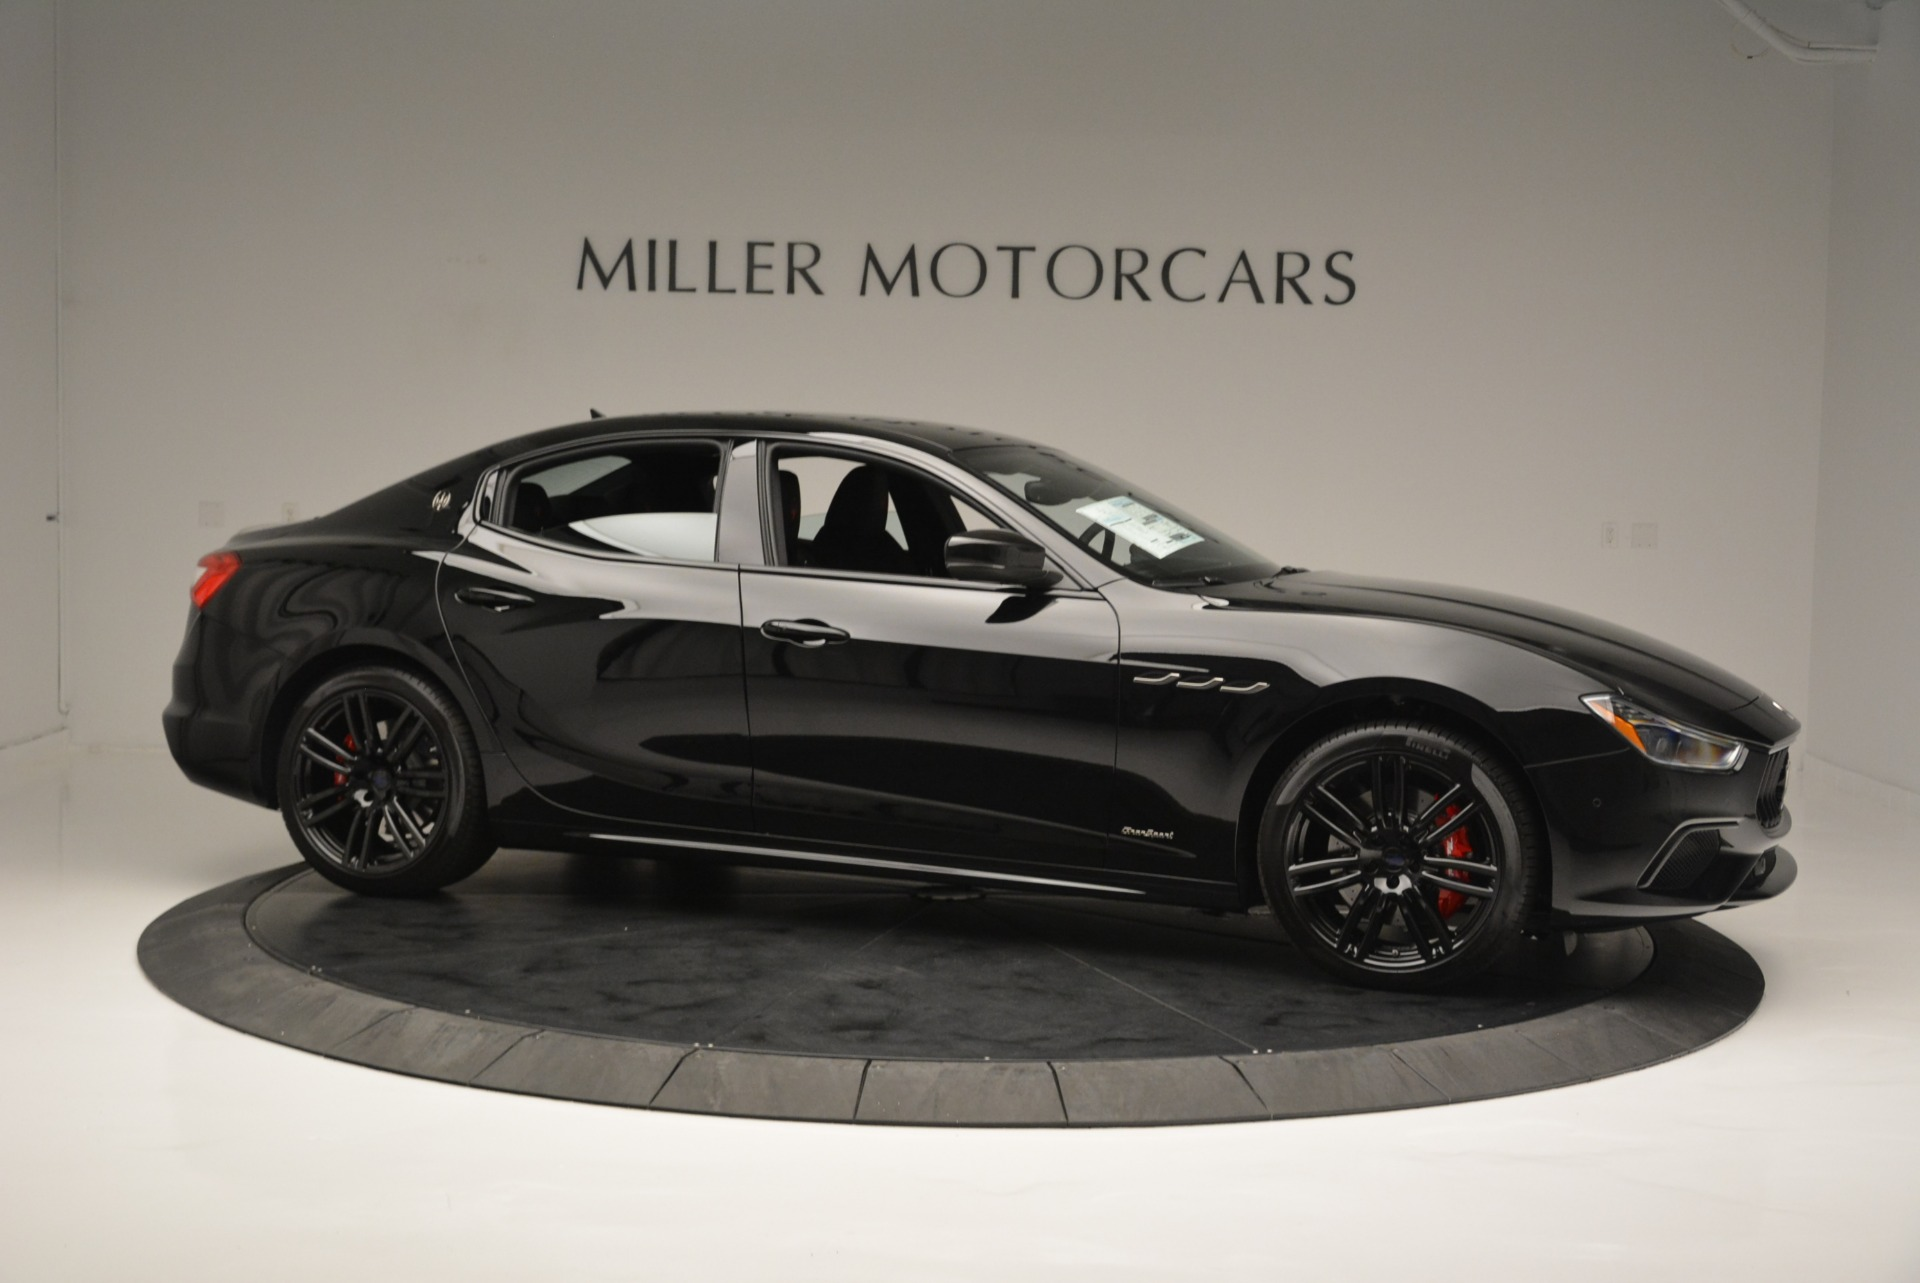 New 2018 Maserati Ghibli SQ4 GranSport Nerissimo For Sale In Westport, CT 2372_p10